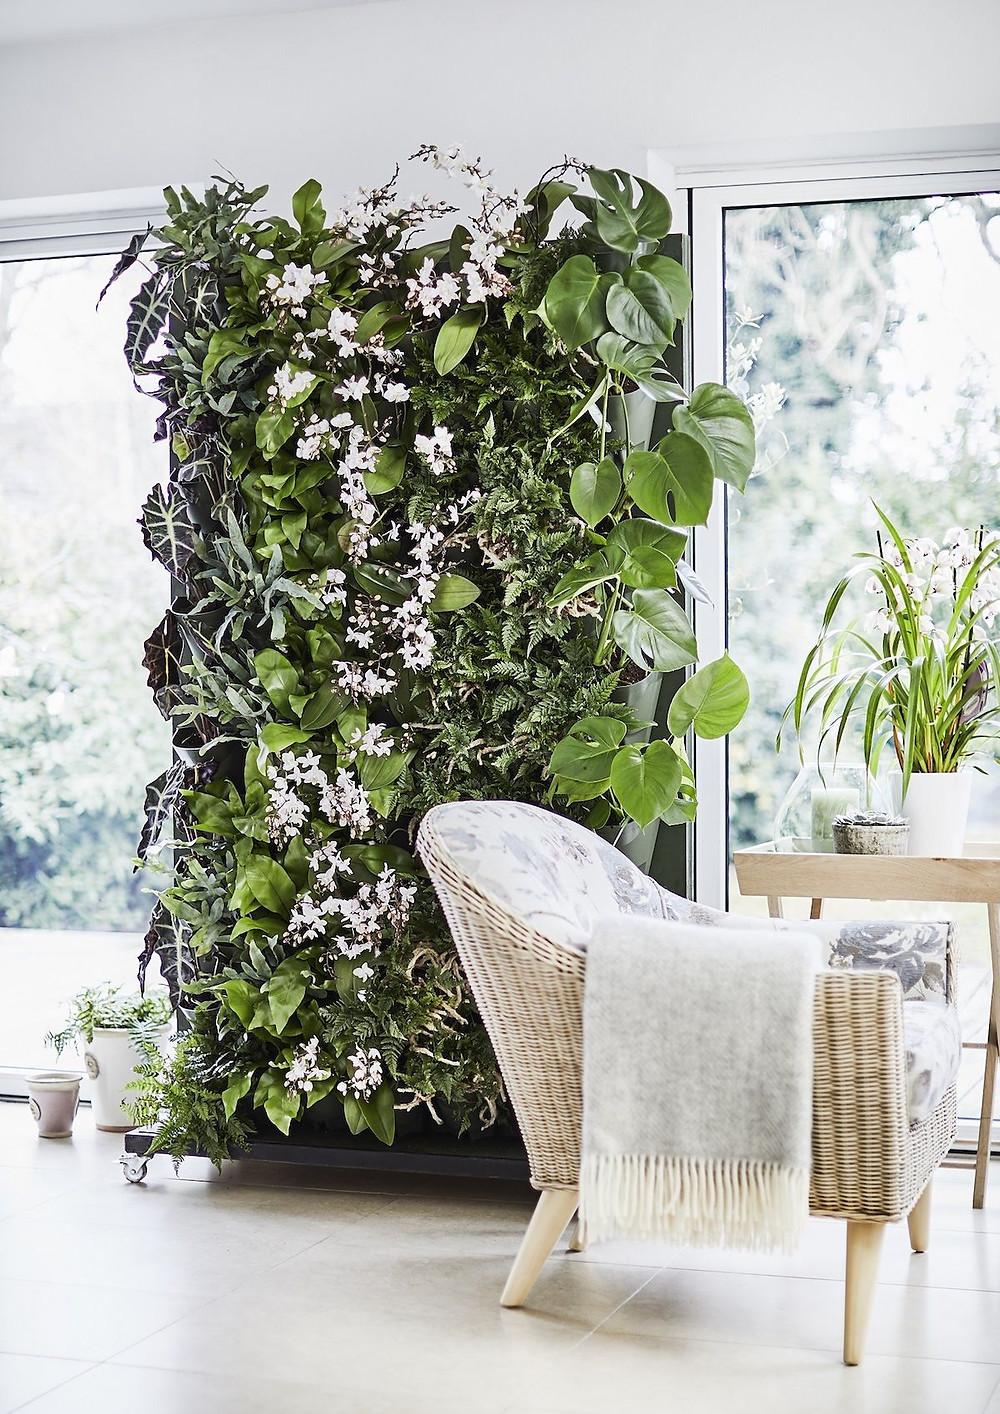 Green wall vertical garden indoors